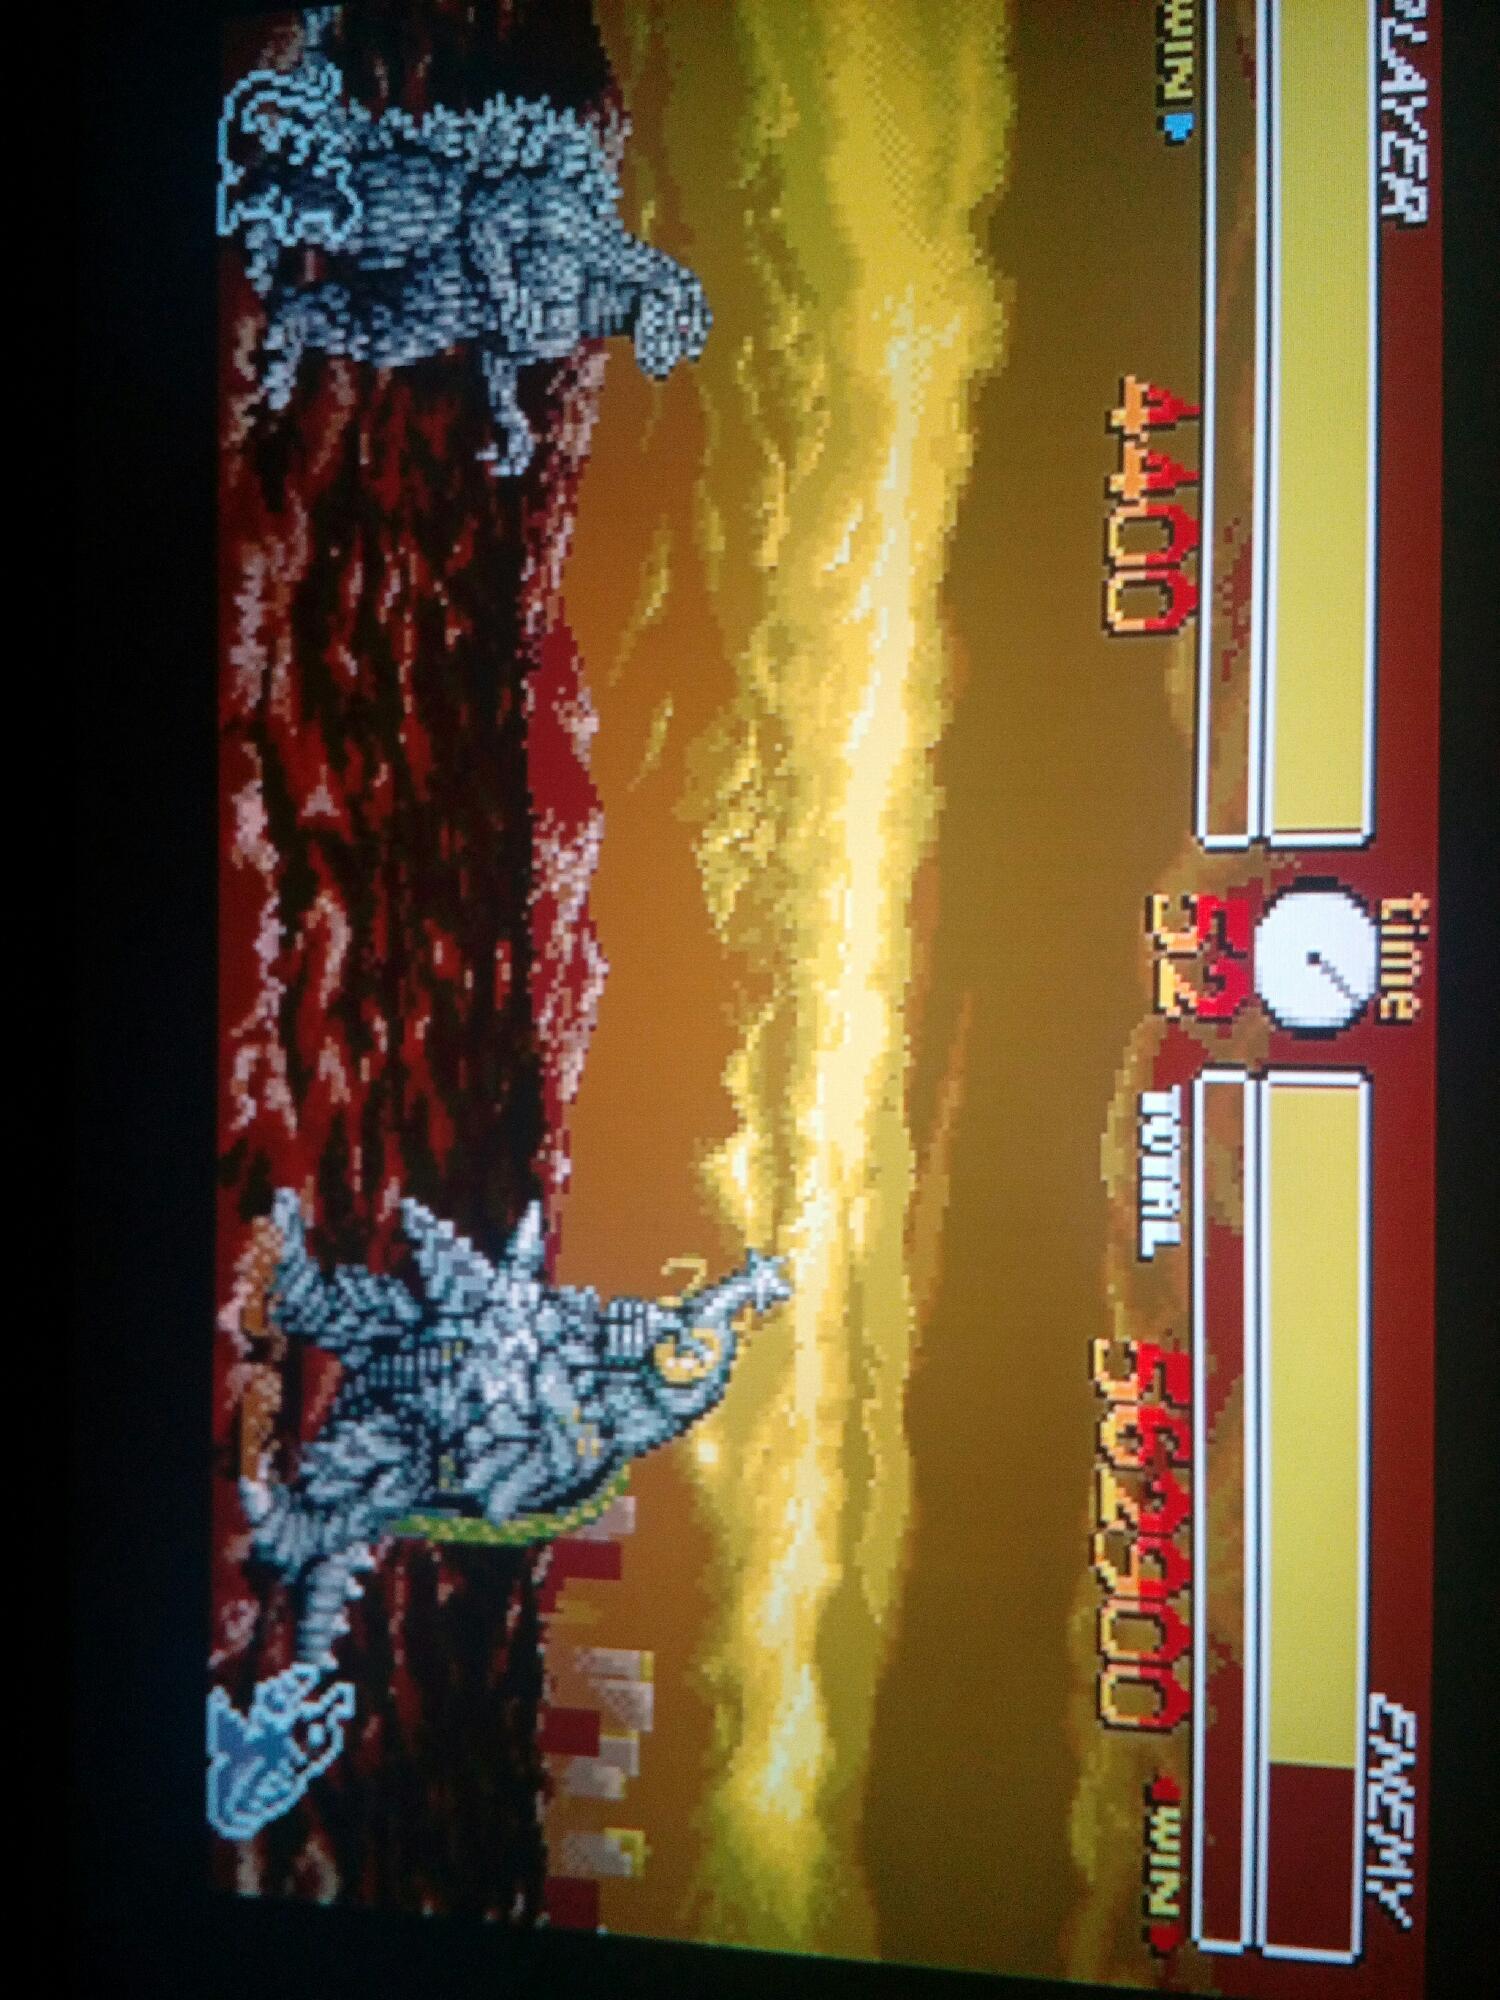 Godzilla se enfrenta al mounstro taladro megalon